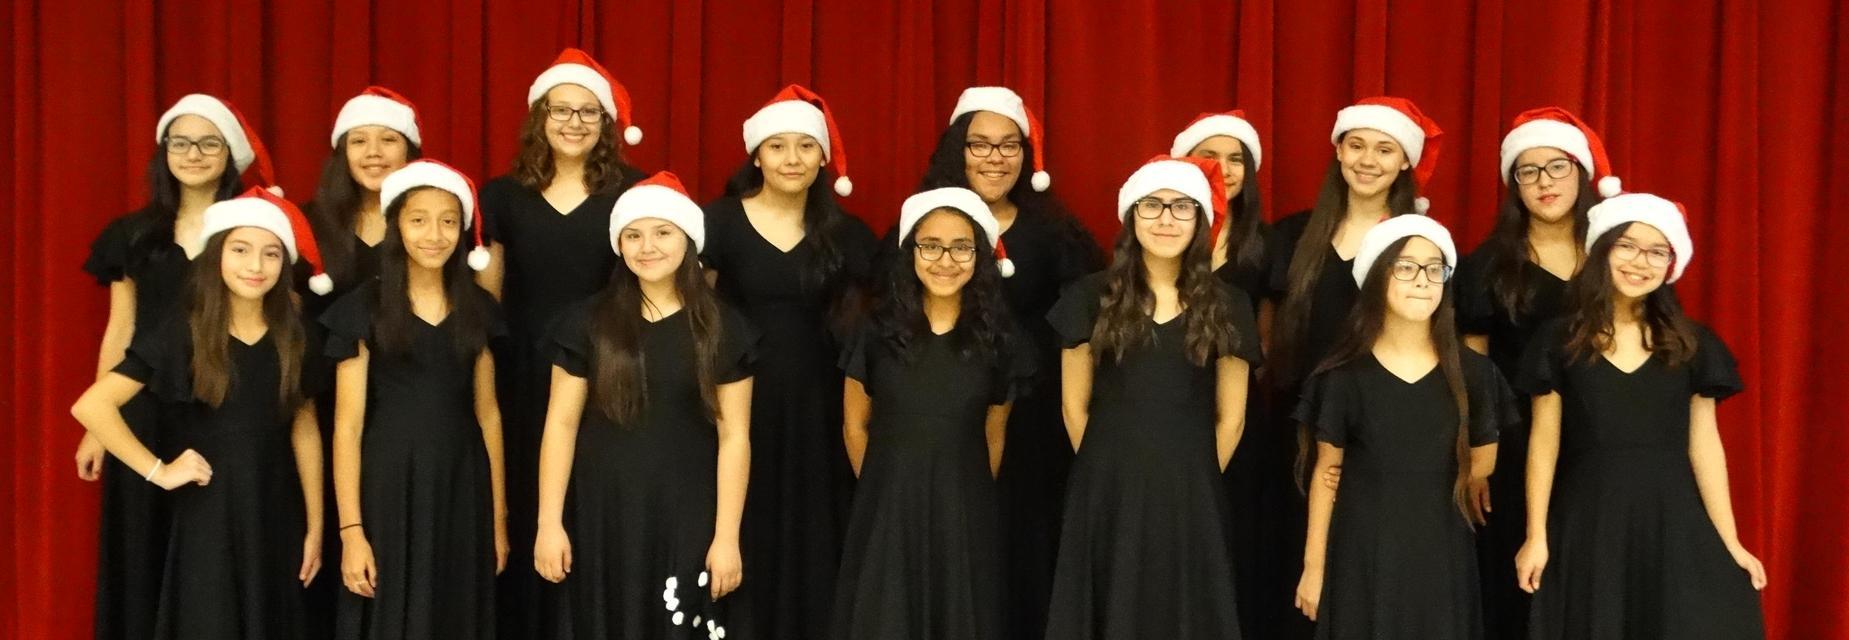 AMJH Choir performed for Waitz